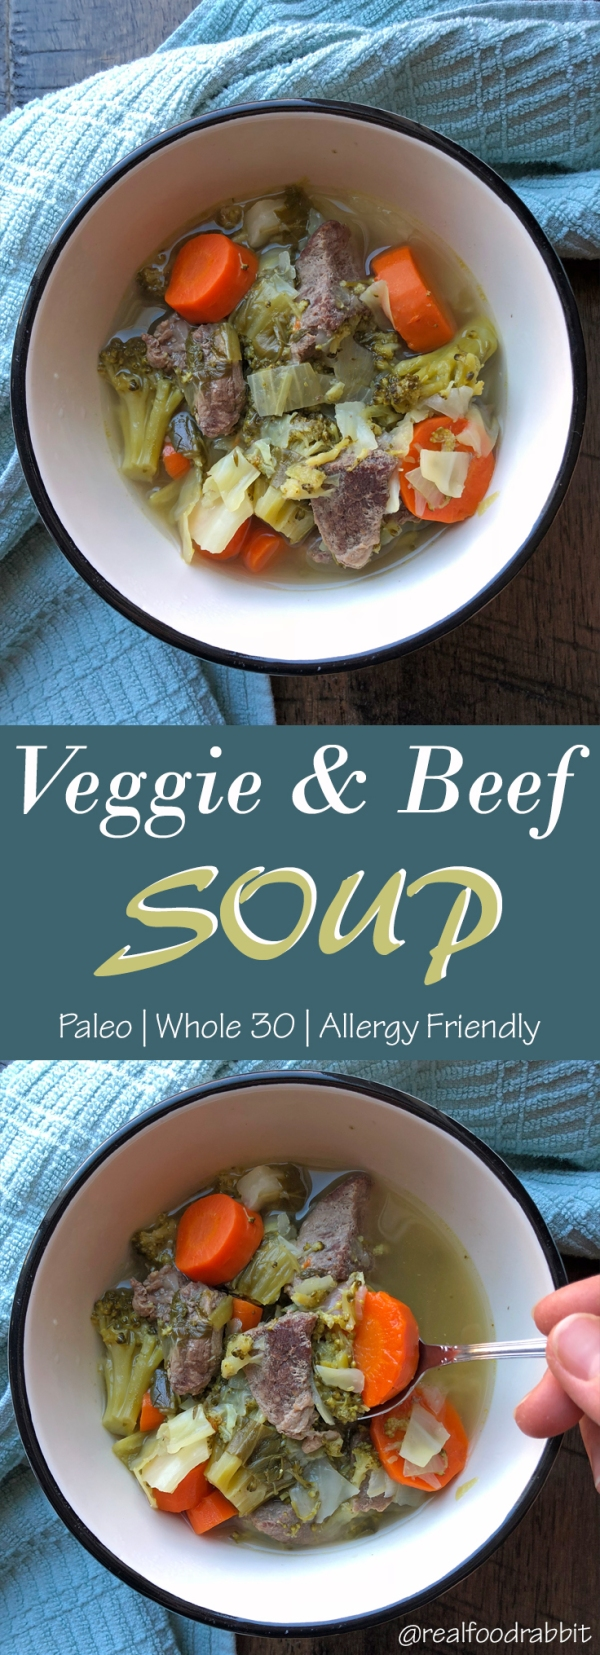 veggie & Beef soup.jpg